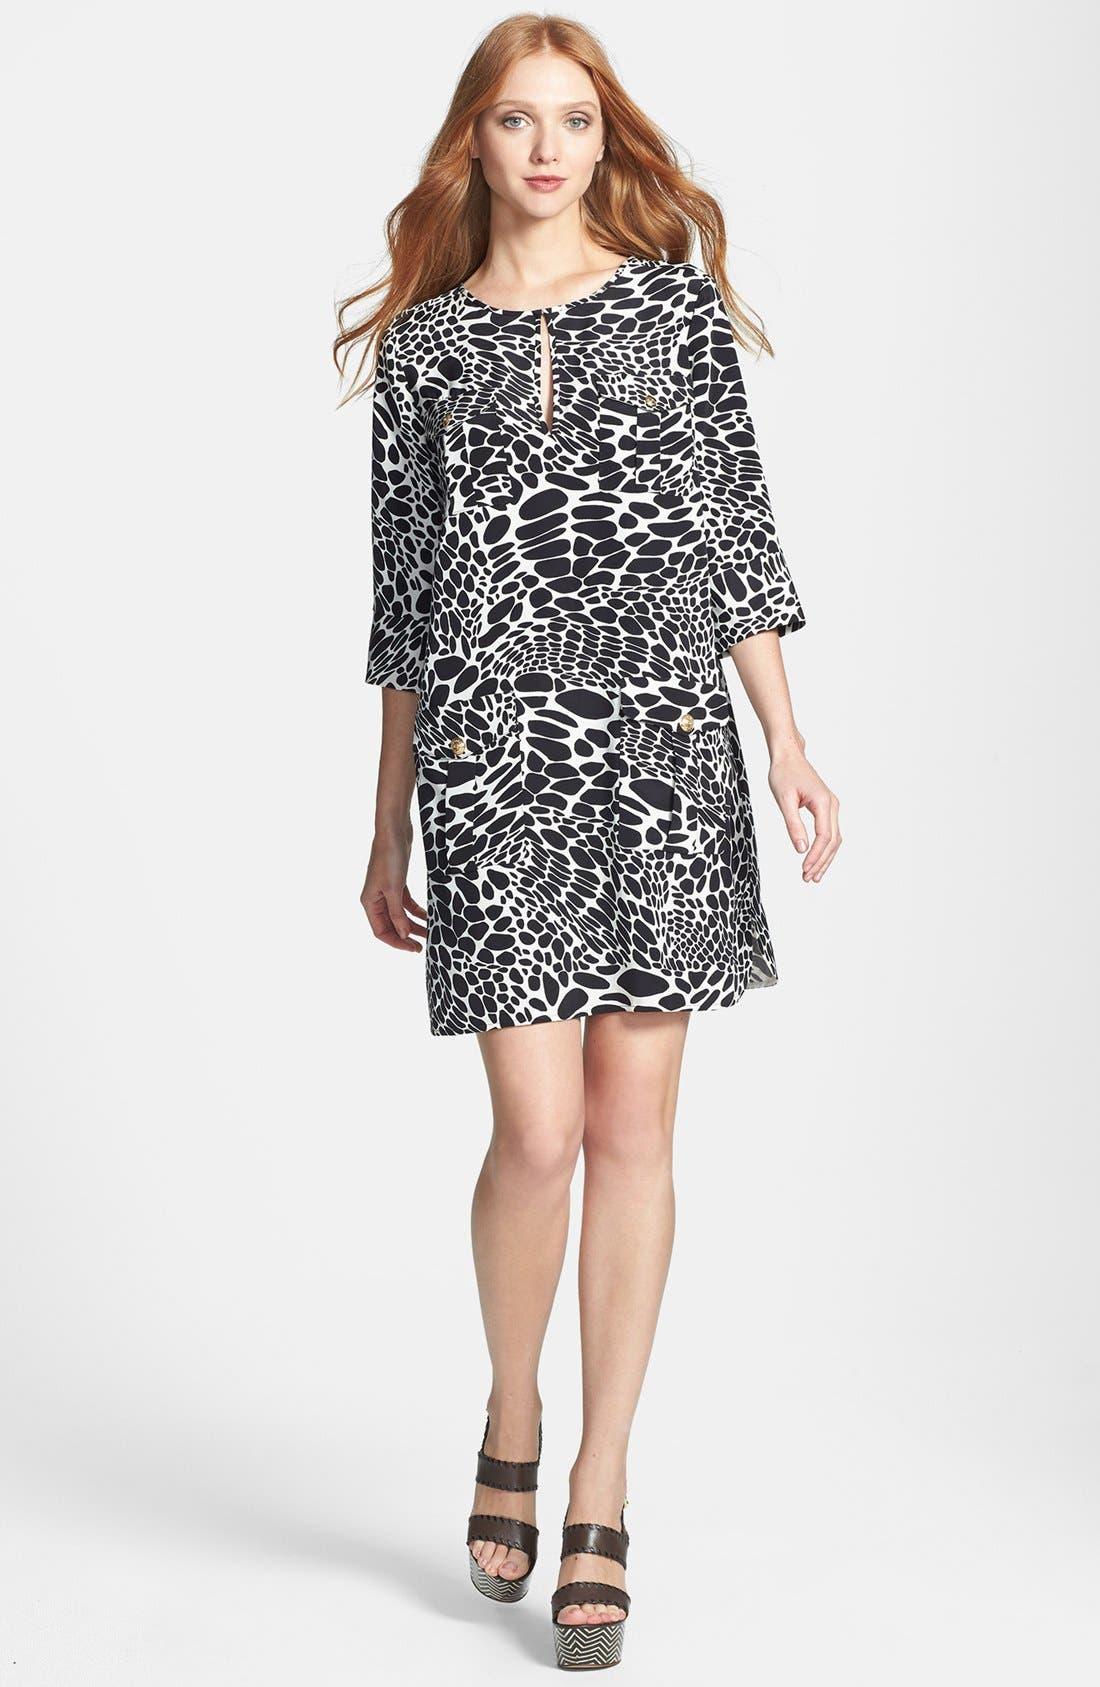 Main Image - Diane von Furstenberg 'Agness' Print Woven Shift Dress